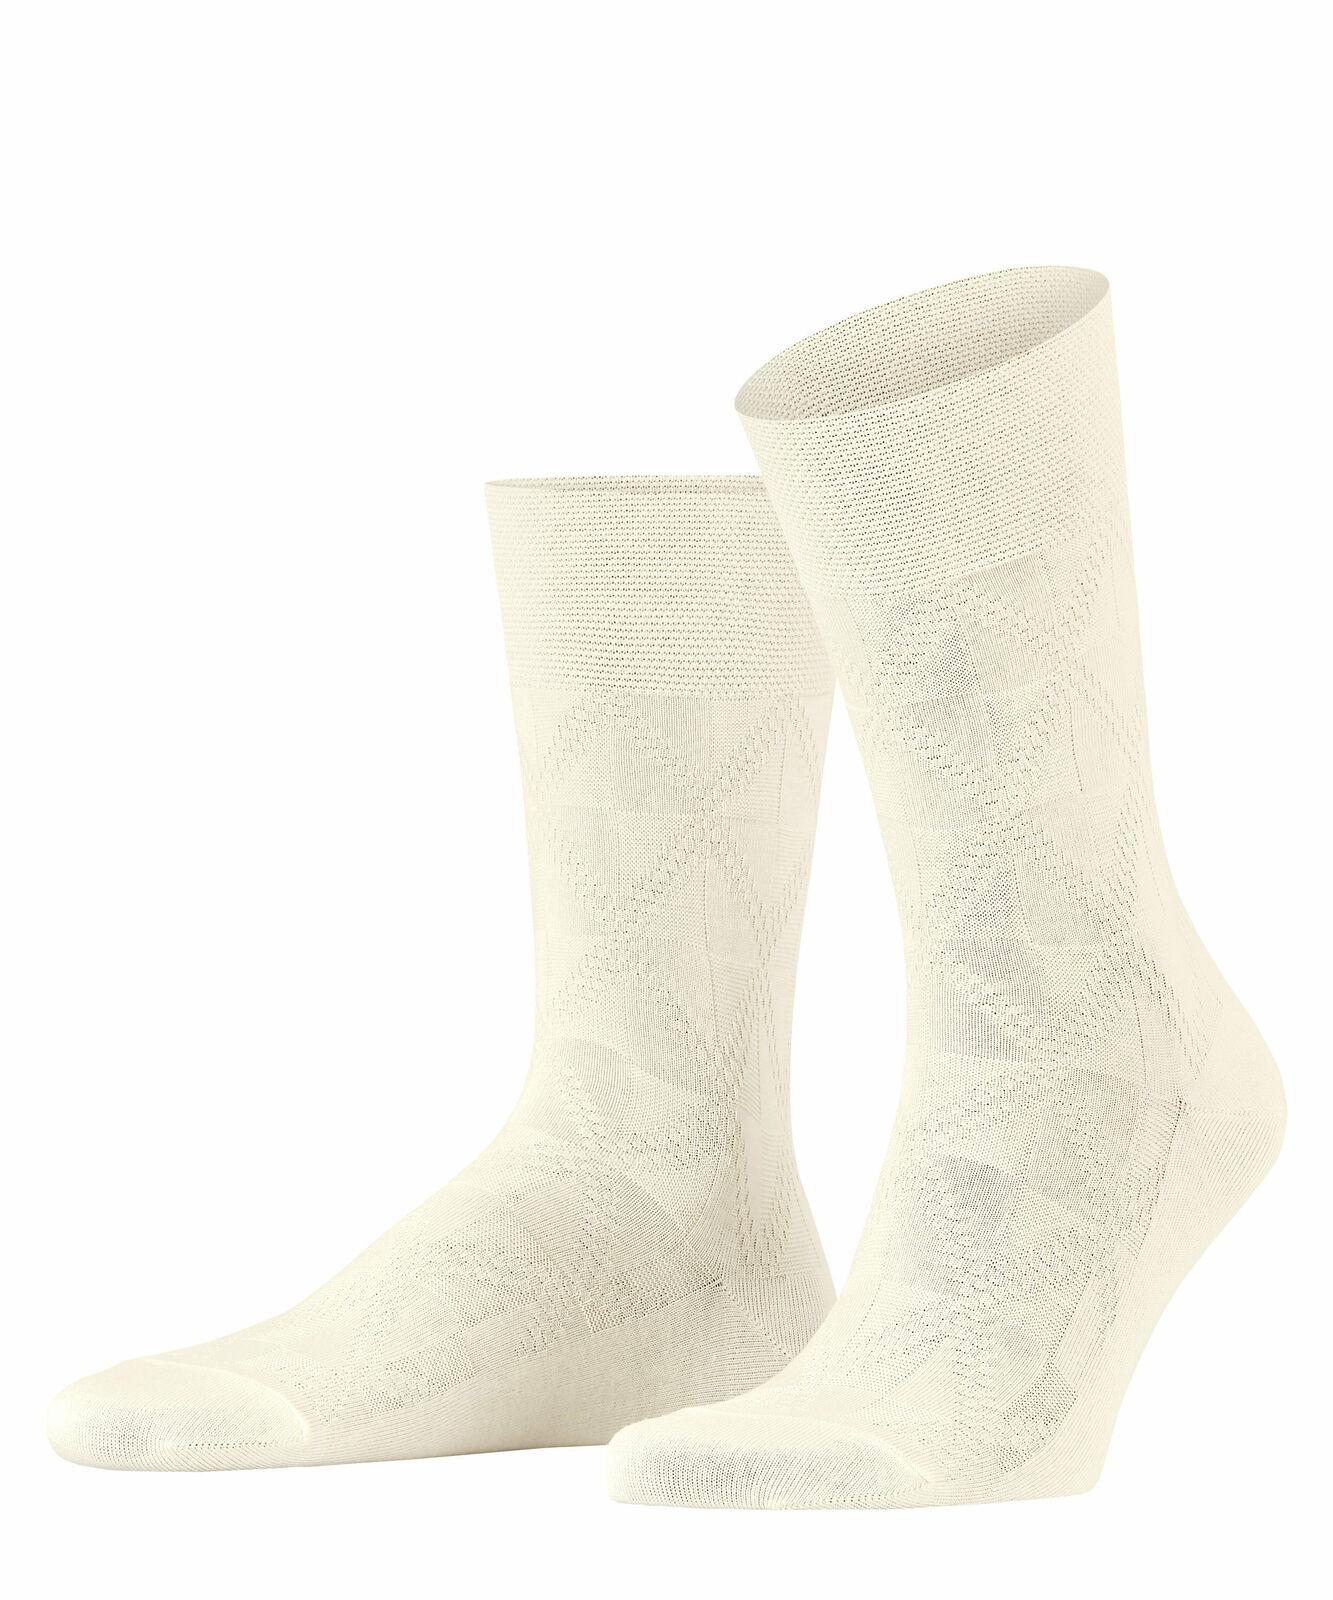 FALKE Sensitive Soft Winter Socken Herren Geometrisch